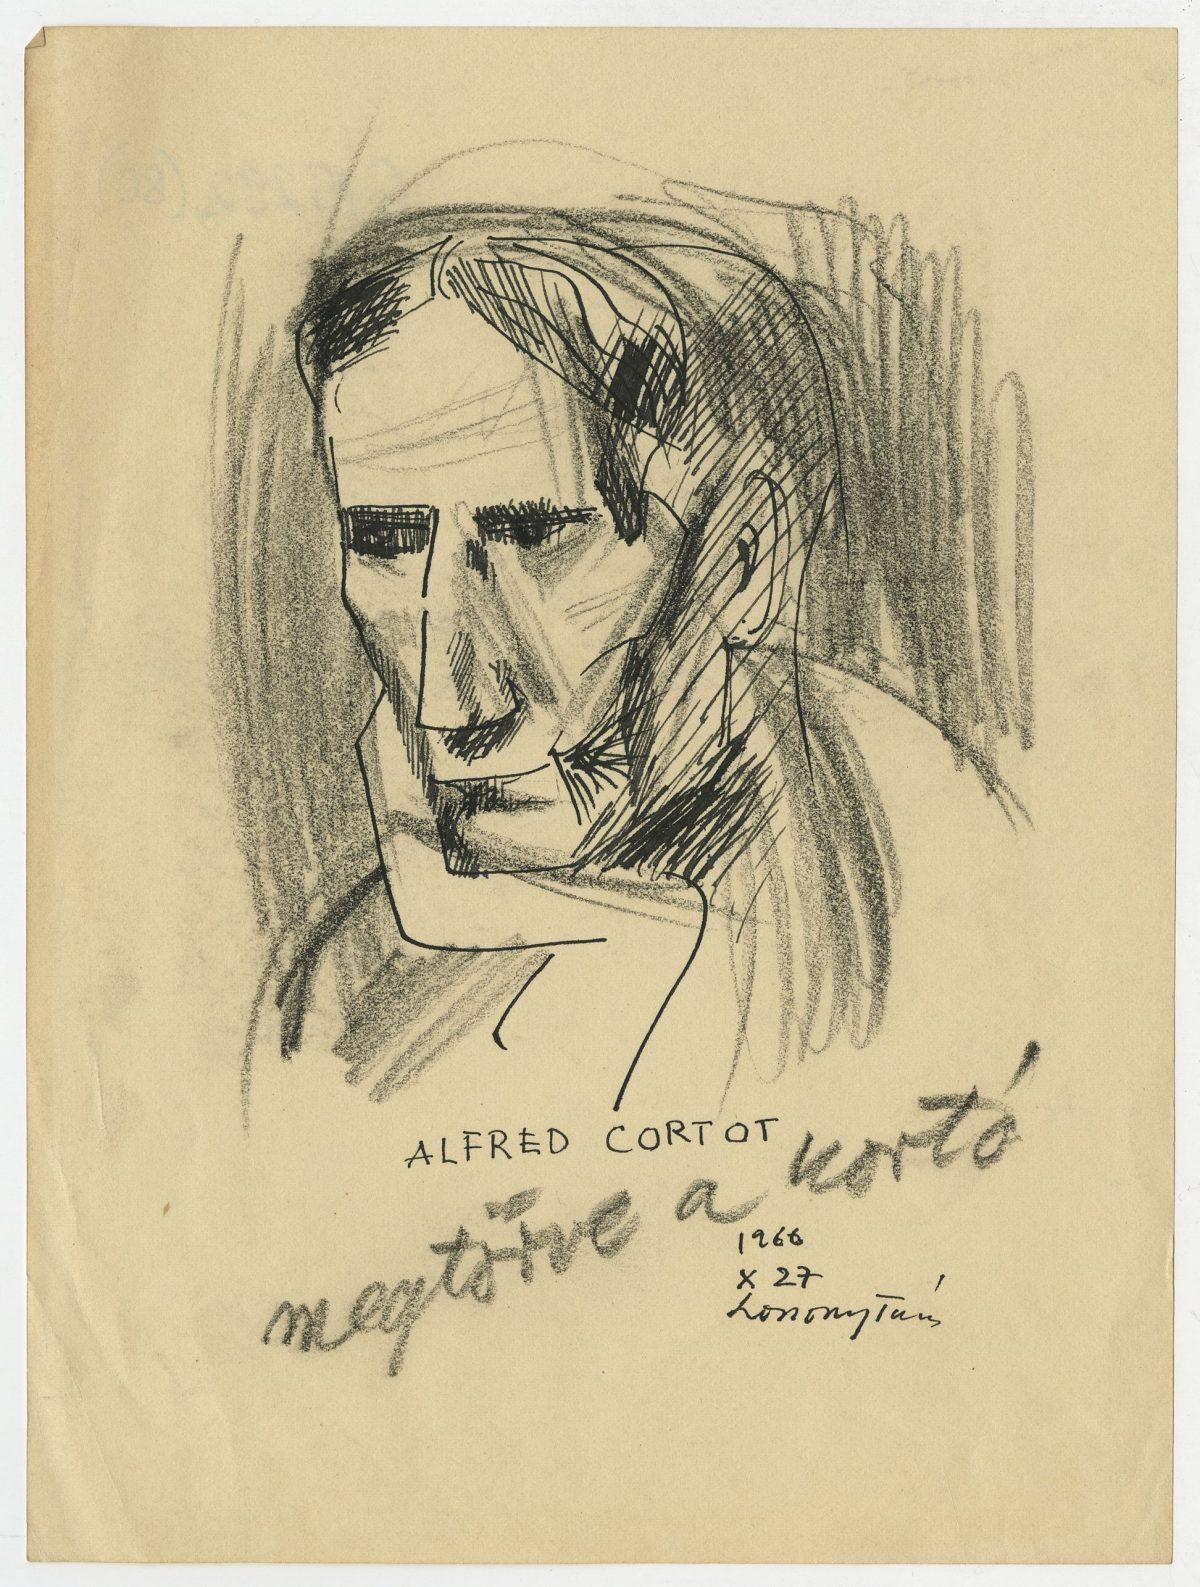 G15292(80)<br/> <b>Cím:</b> Alfred Cortot megtörve a kortó <br/> <b>Méret cm:</b> 21,1x15,7 <br/> <b>Készült:</b> 1966. <br/> <b>Technika:</b> tus, ceruza<br/>